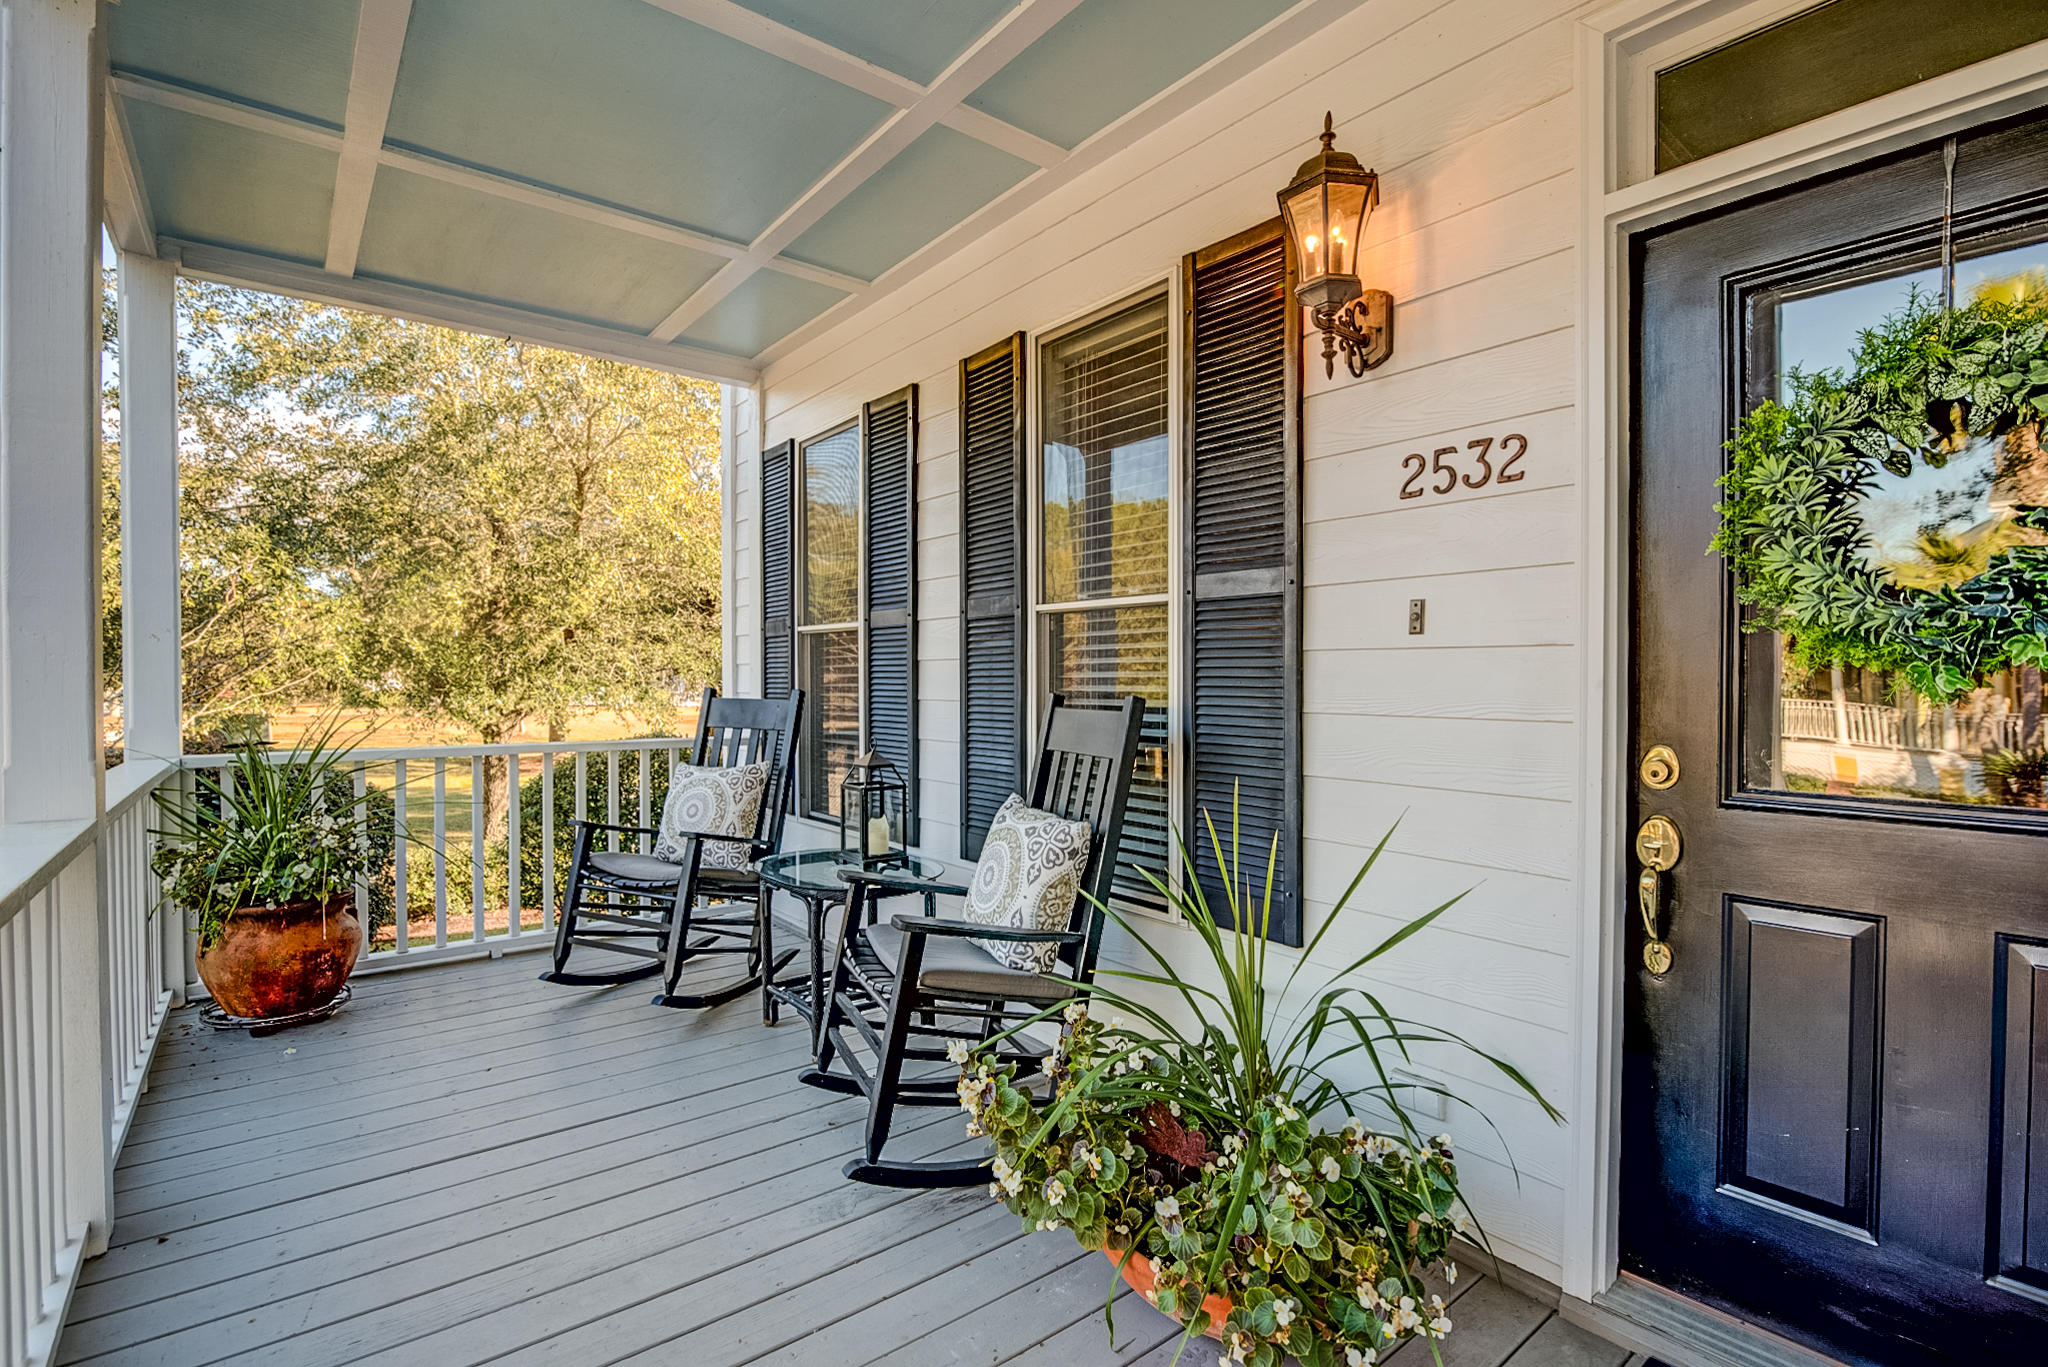 Rivertowne Homes For Sale - 2532 Rivertowne, Mount Pleasant, SC - 25